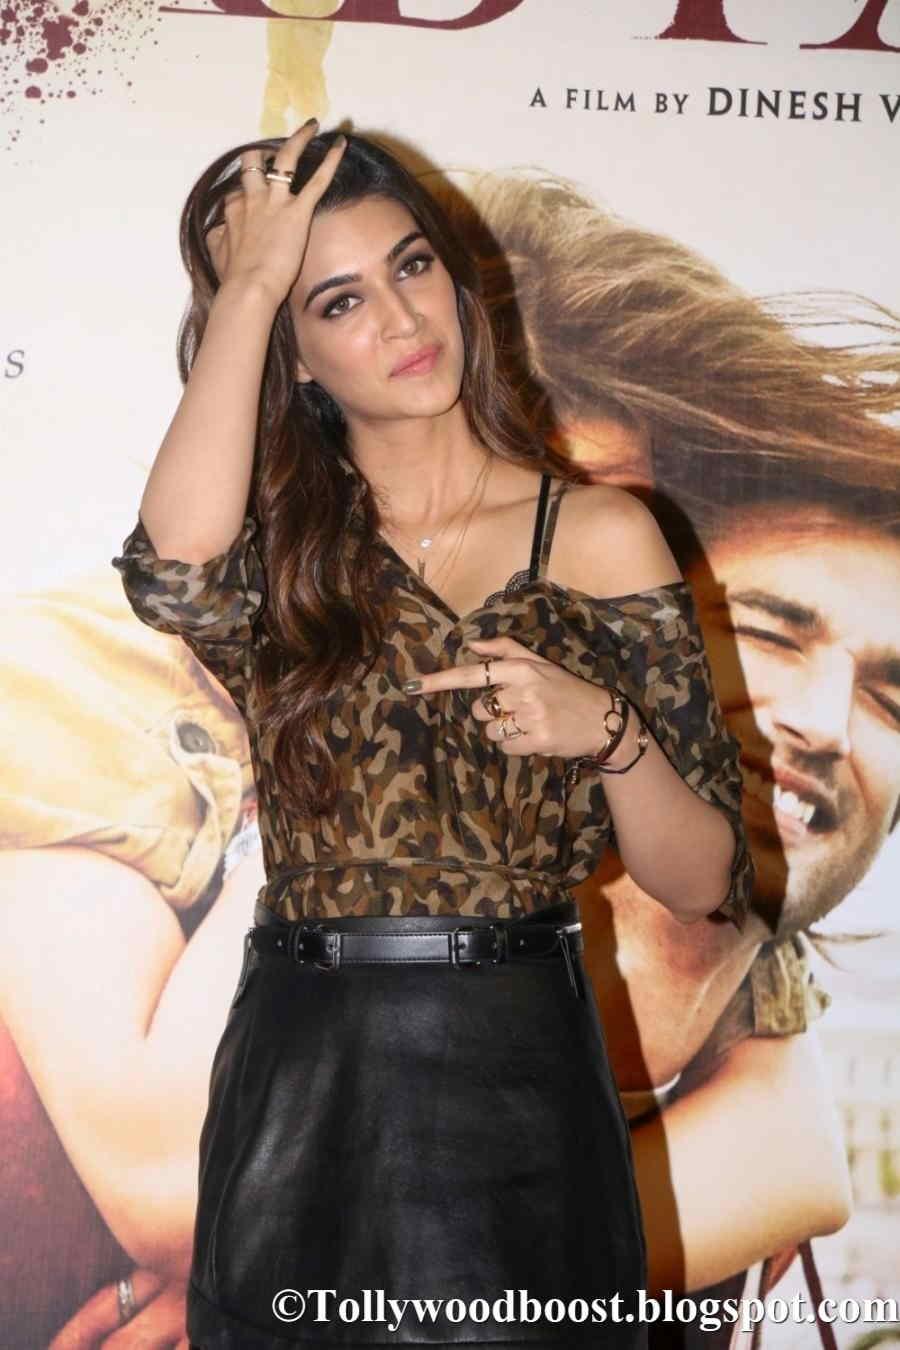 Actress Kriti Sanon Long Legs Thighs Show In Black Mini Dress